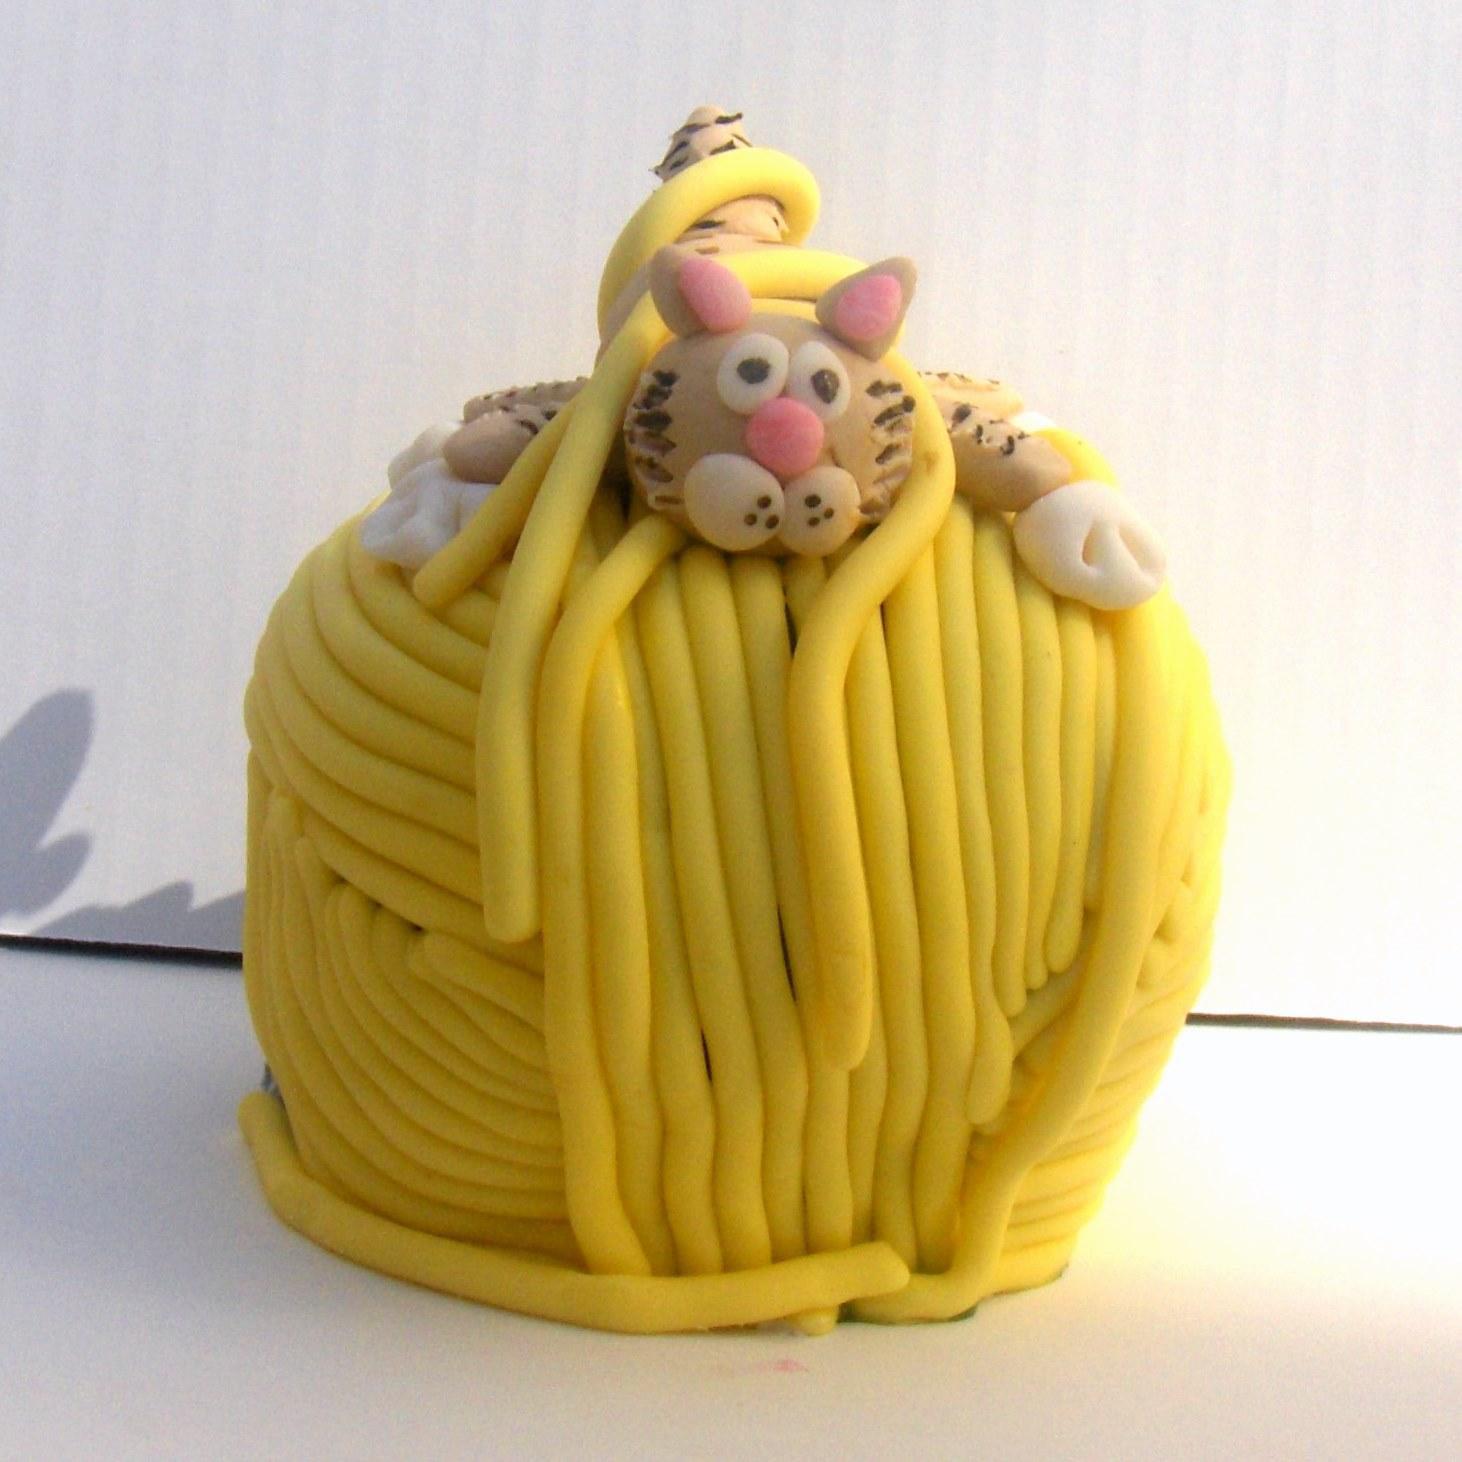 How To Make A Yarn Ball Cake